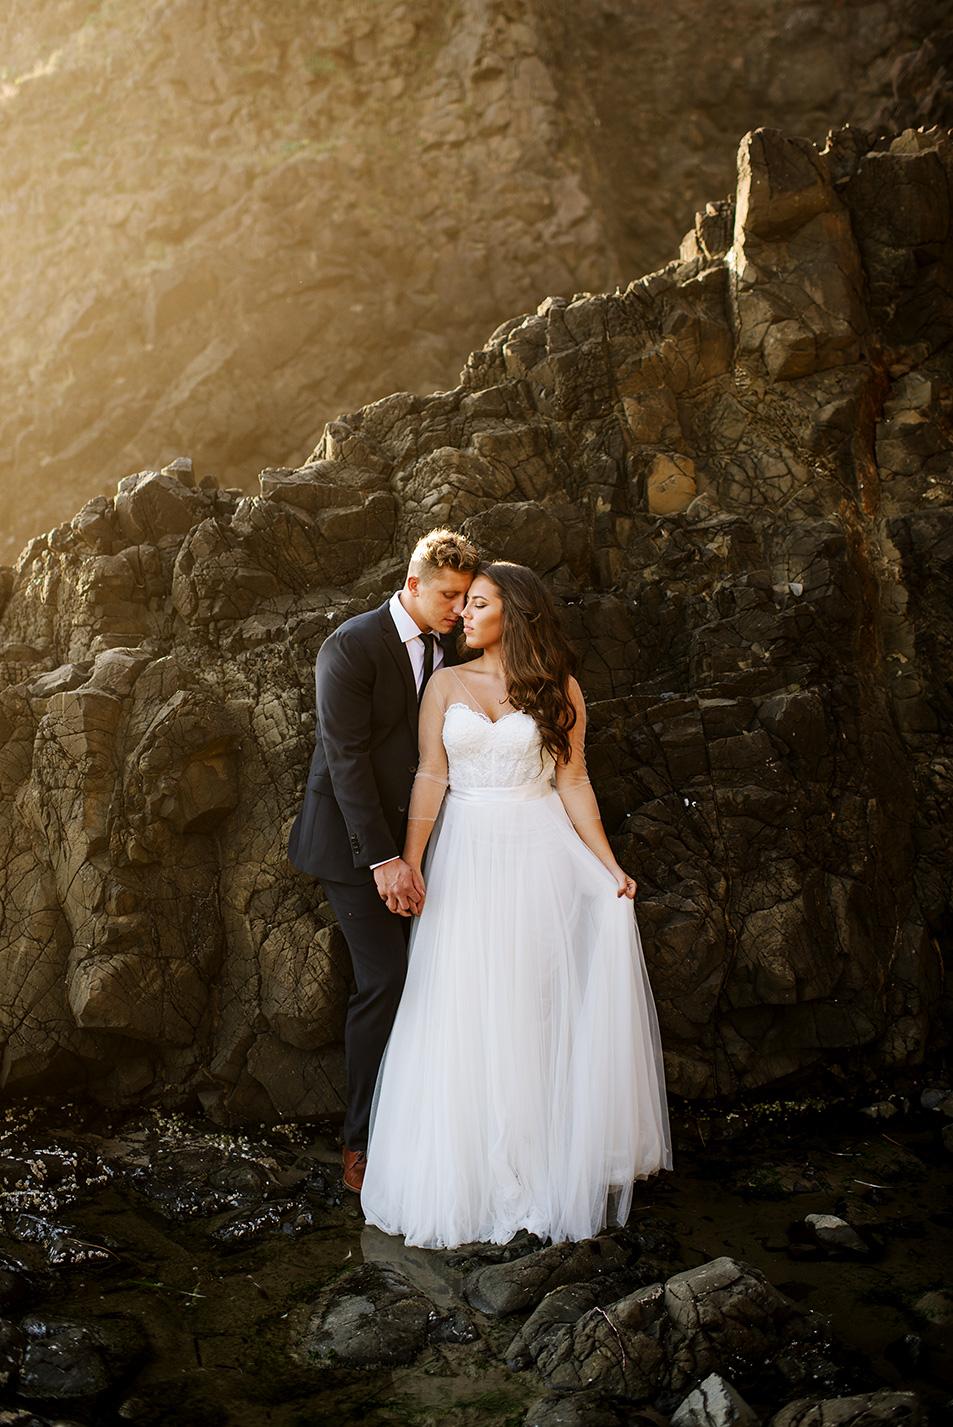 cannon-beach-wedding-portland-wedding-photography68.jpg